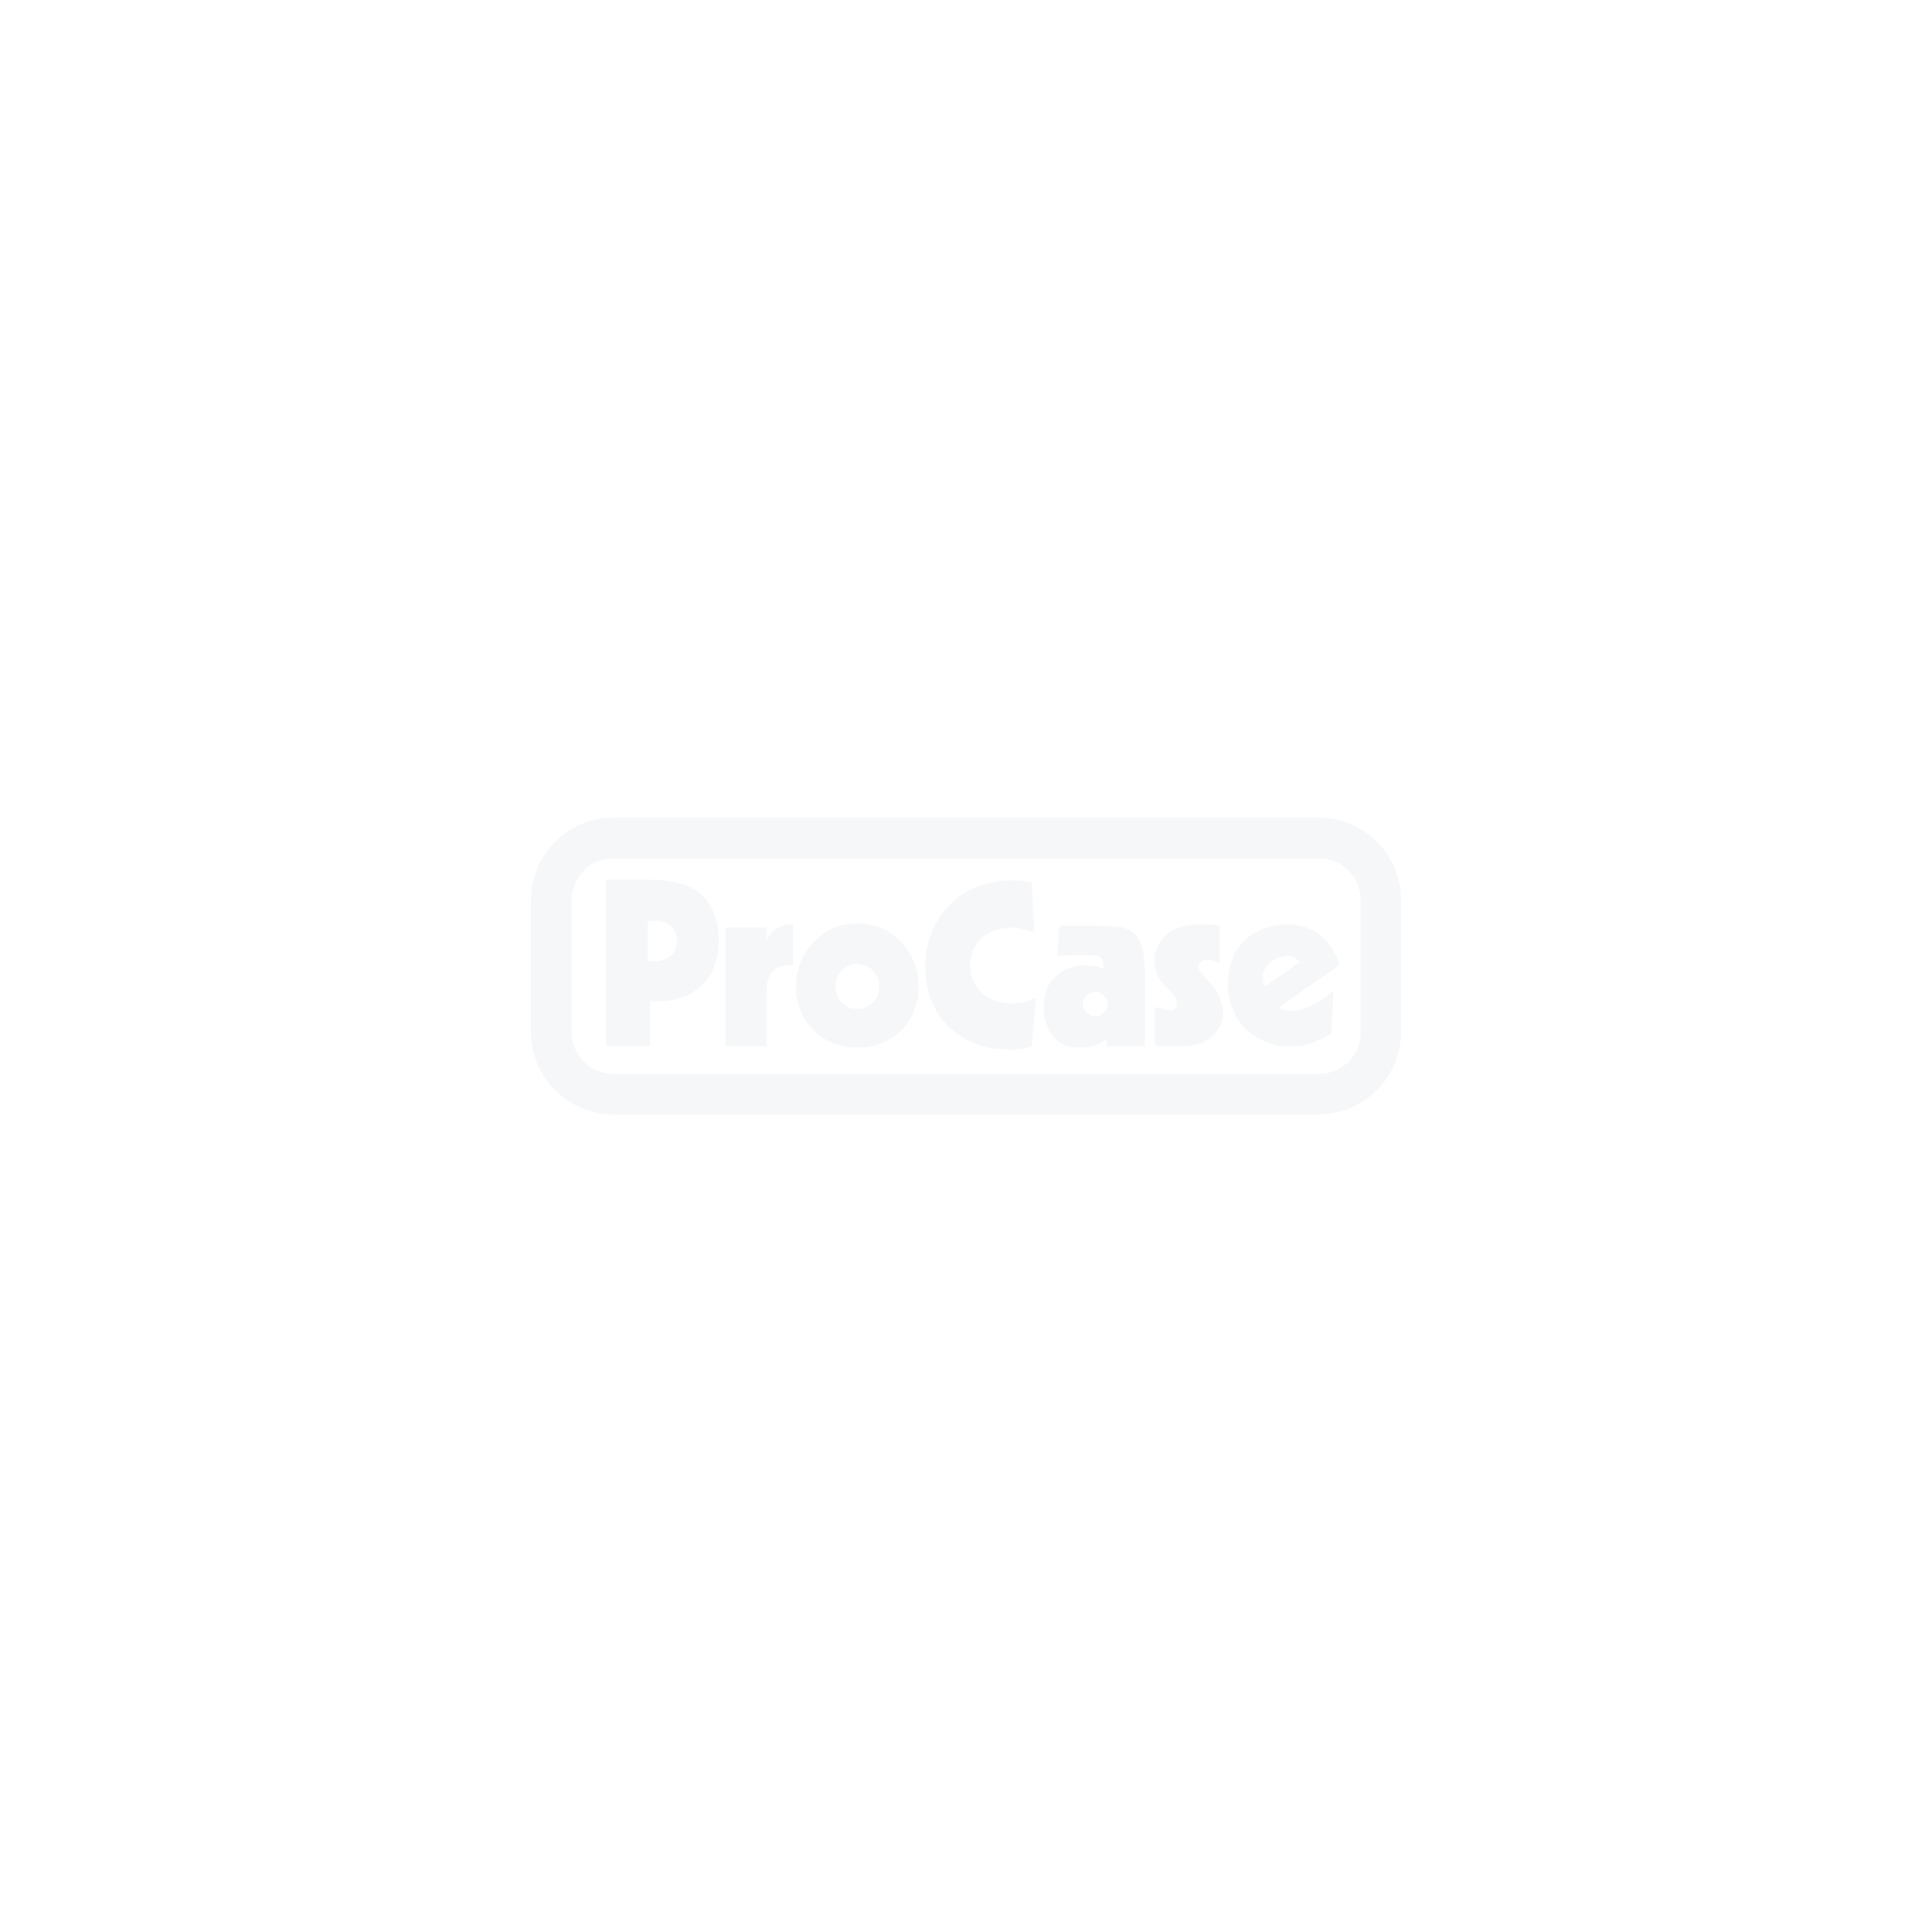 Flightcase für 2x Futurelight MH-660 Moving Head